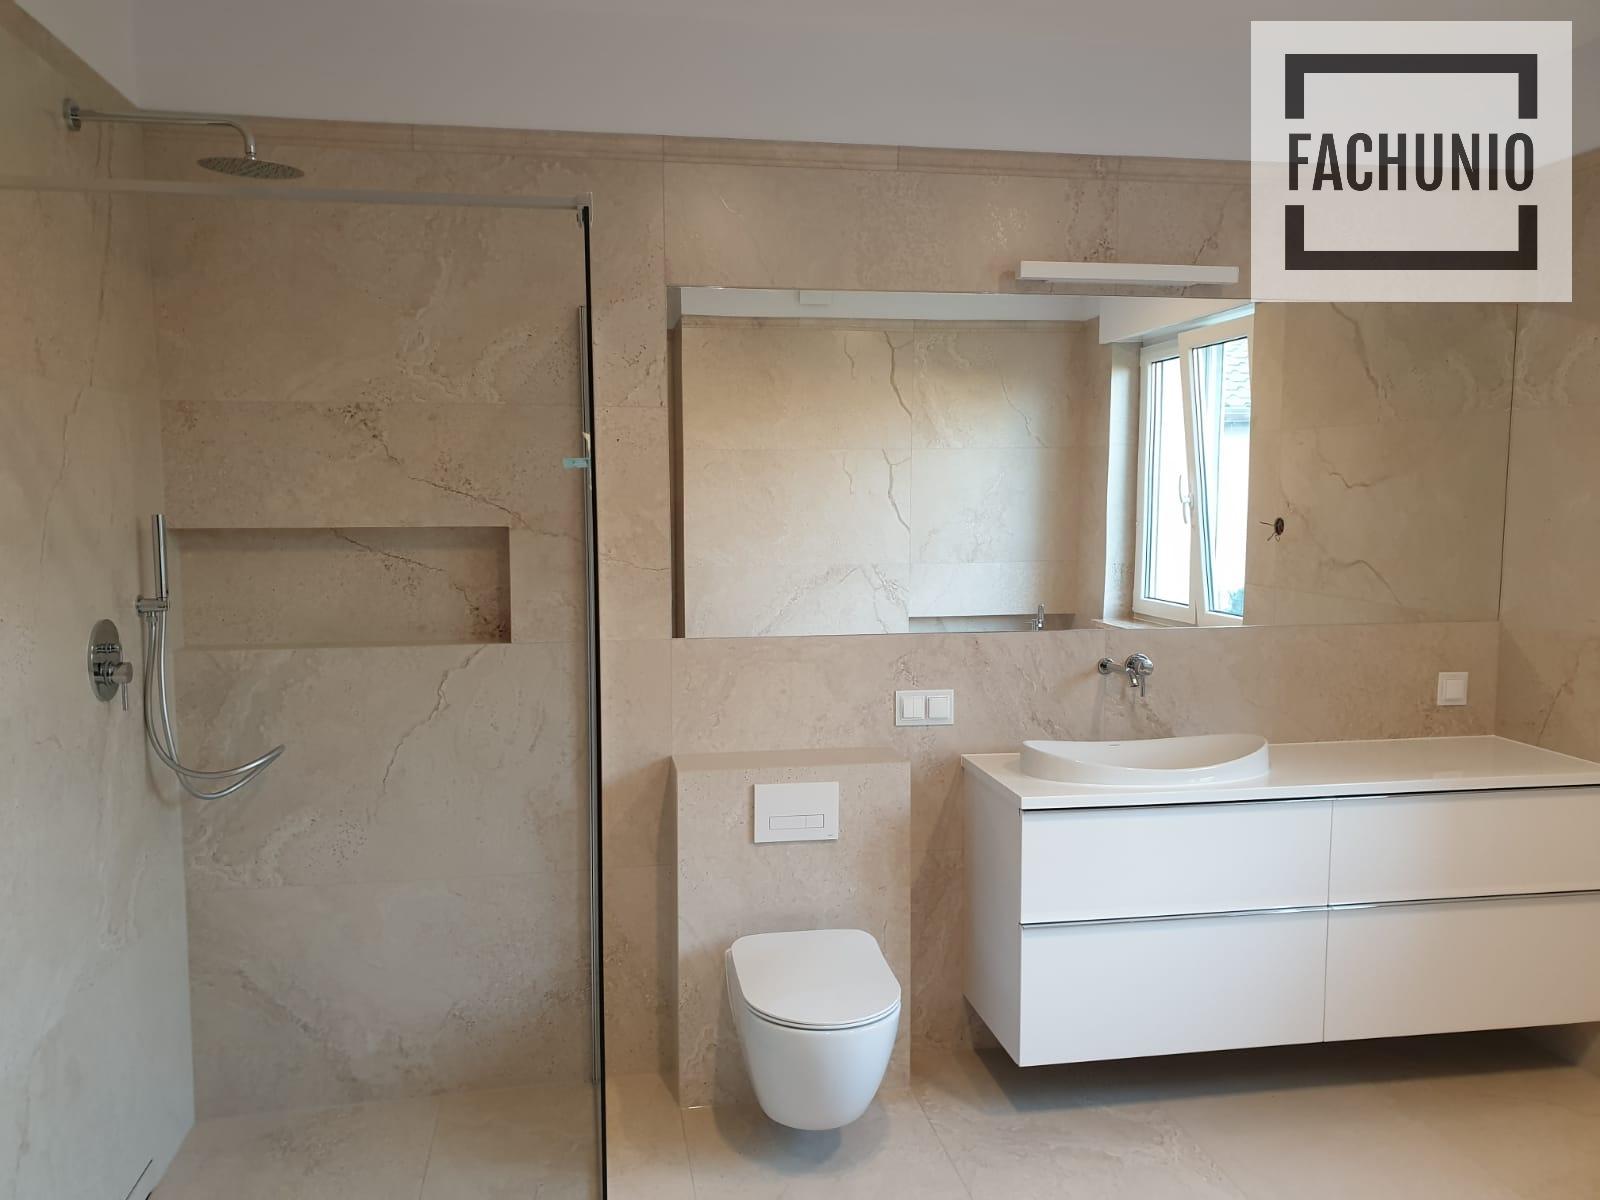 łazienka, remont ,kafelkowanie, glazurnik